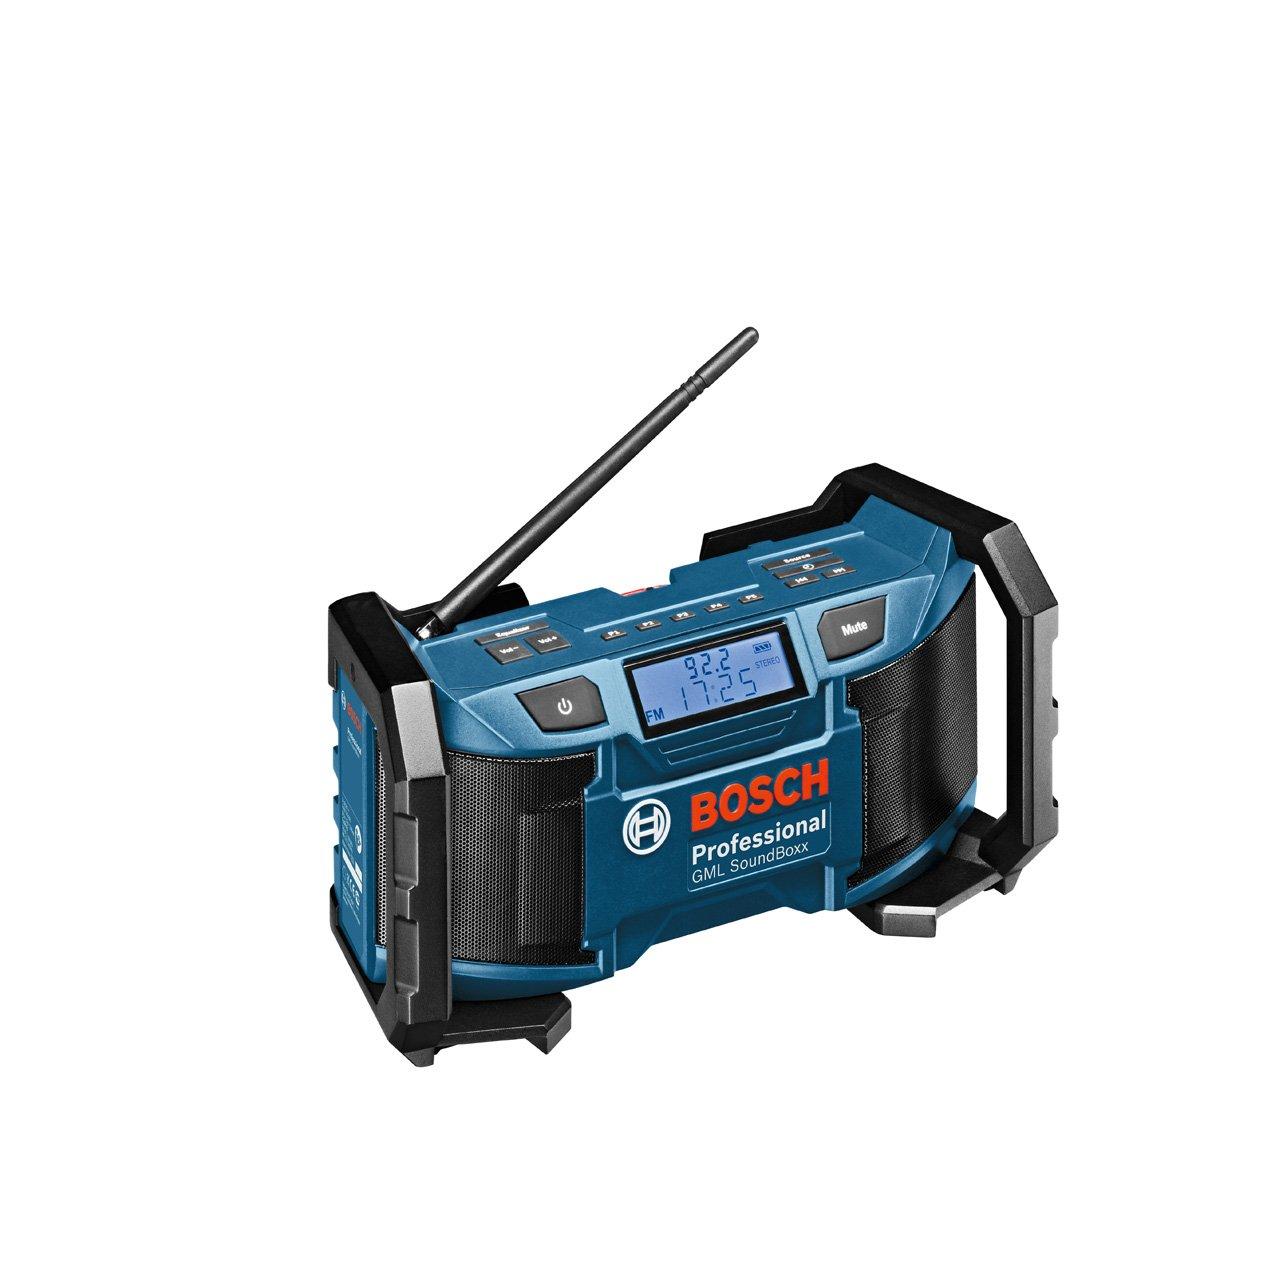 Bosch Professional GML SoundBoxx, 531  1.602 kHz Radiofrequenzbereich AM, 87,5  108 MHz Radiofrequenzbereich FM, DCin Adapter, AuxIn Kabel  BaumarktBewertungen